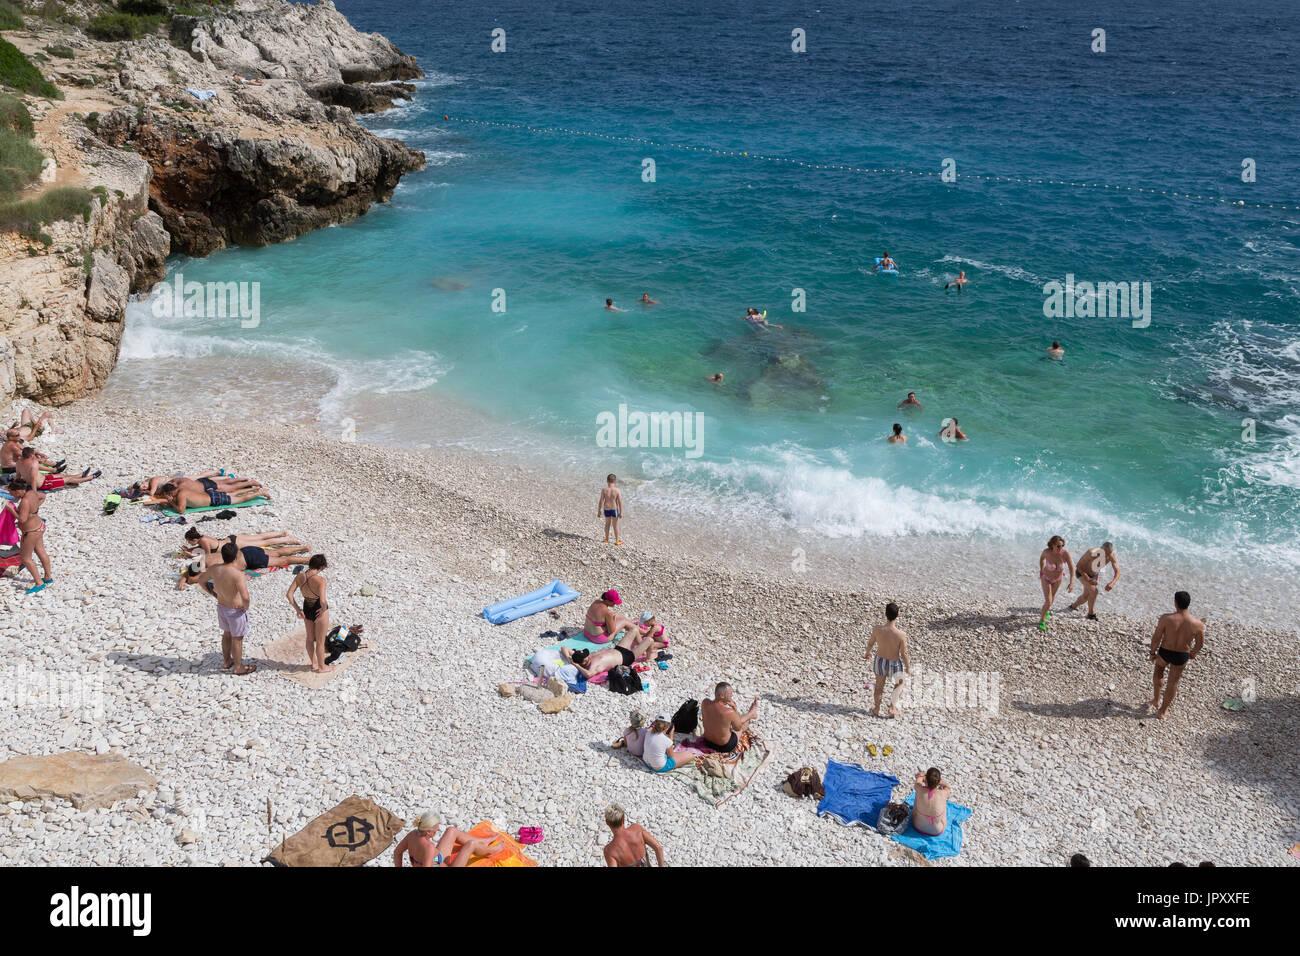 Beach in Pula, Croatia - Stock Image